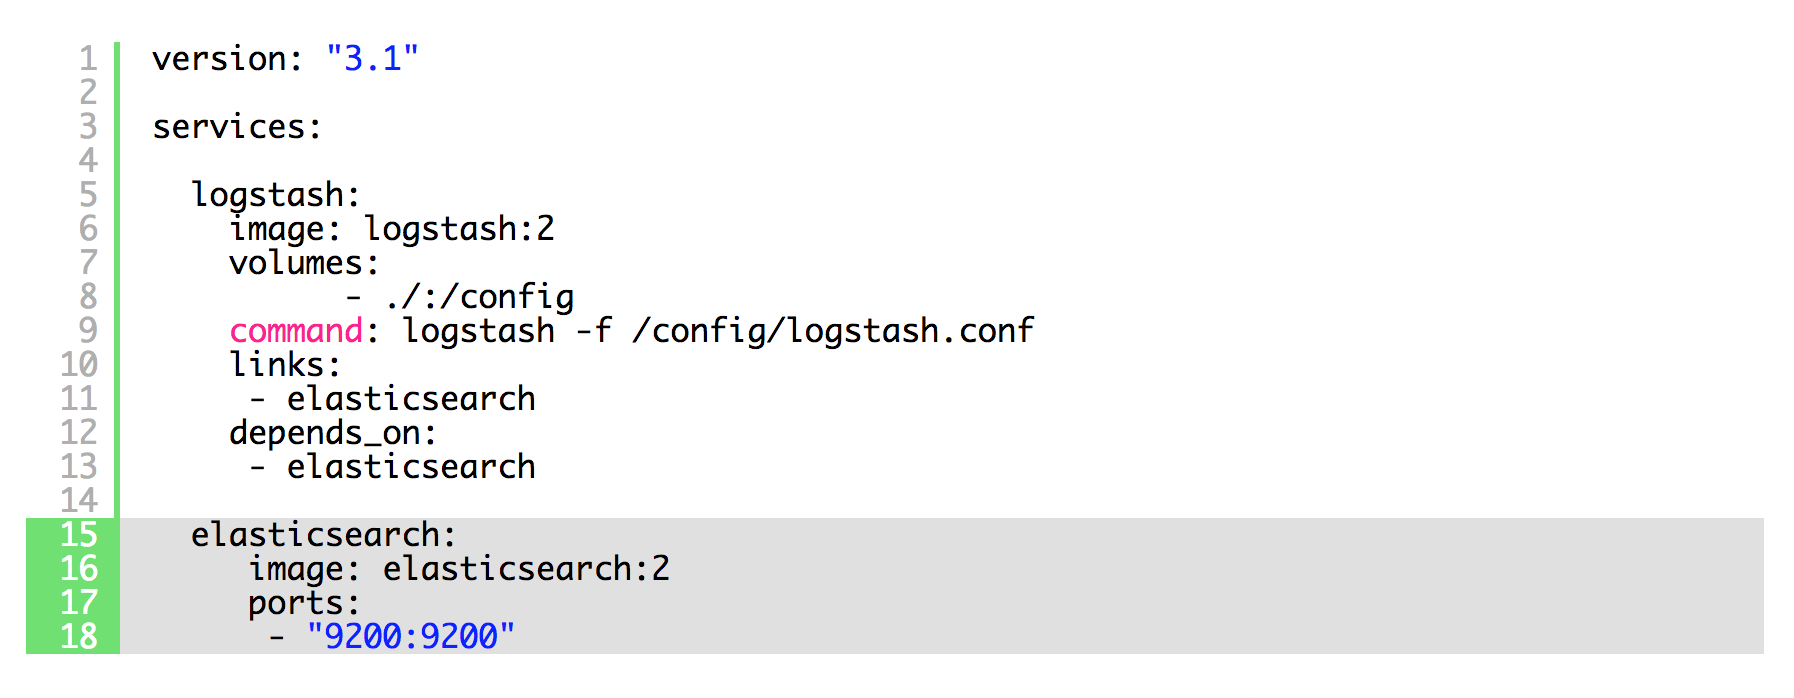 Putting Jenkins Build Logs Into Dockerized ELK Stack - DZone DevOps